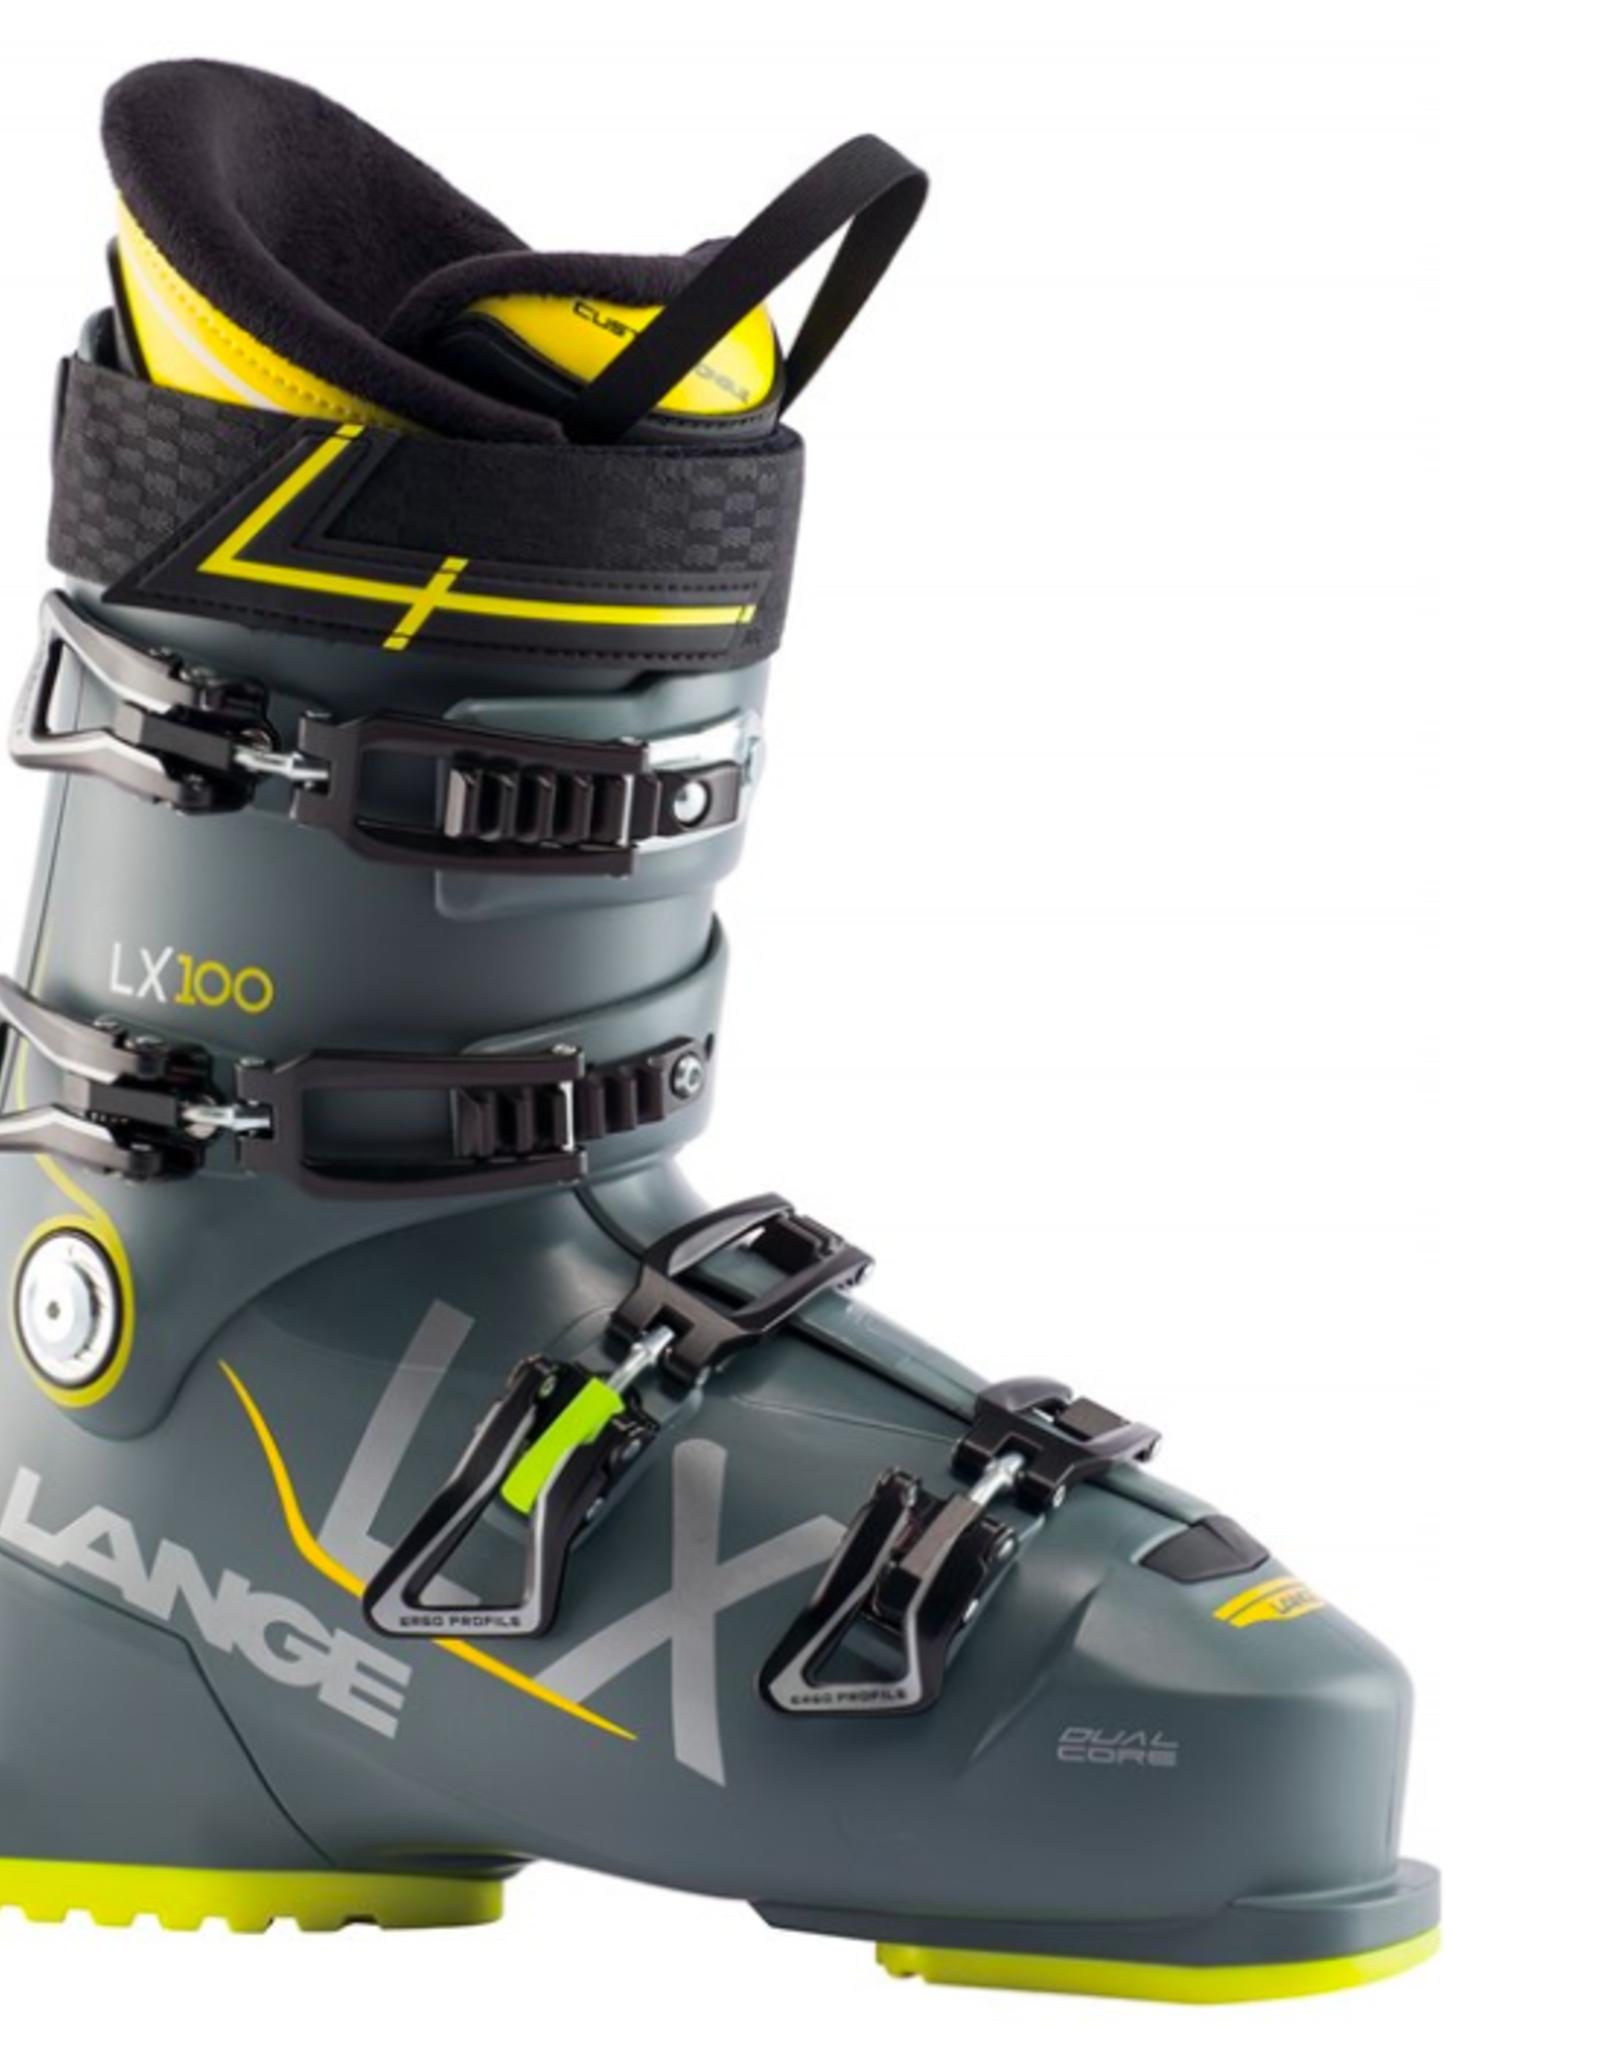 Lange Men's LX 100 Ski Boots Thunder Grey 2022